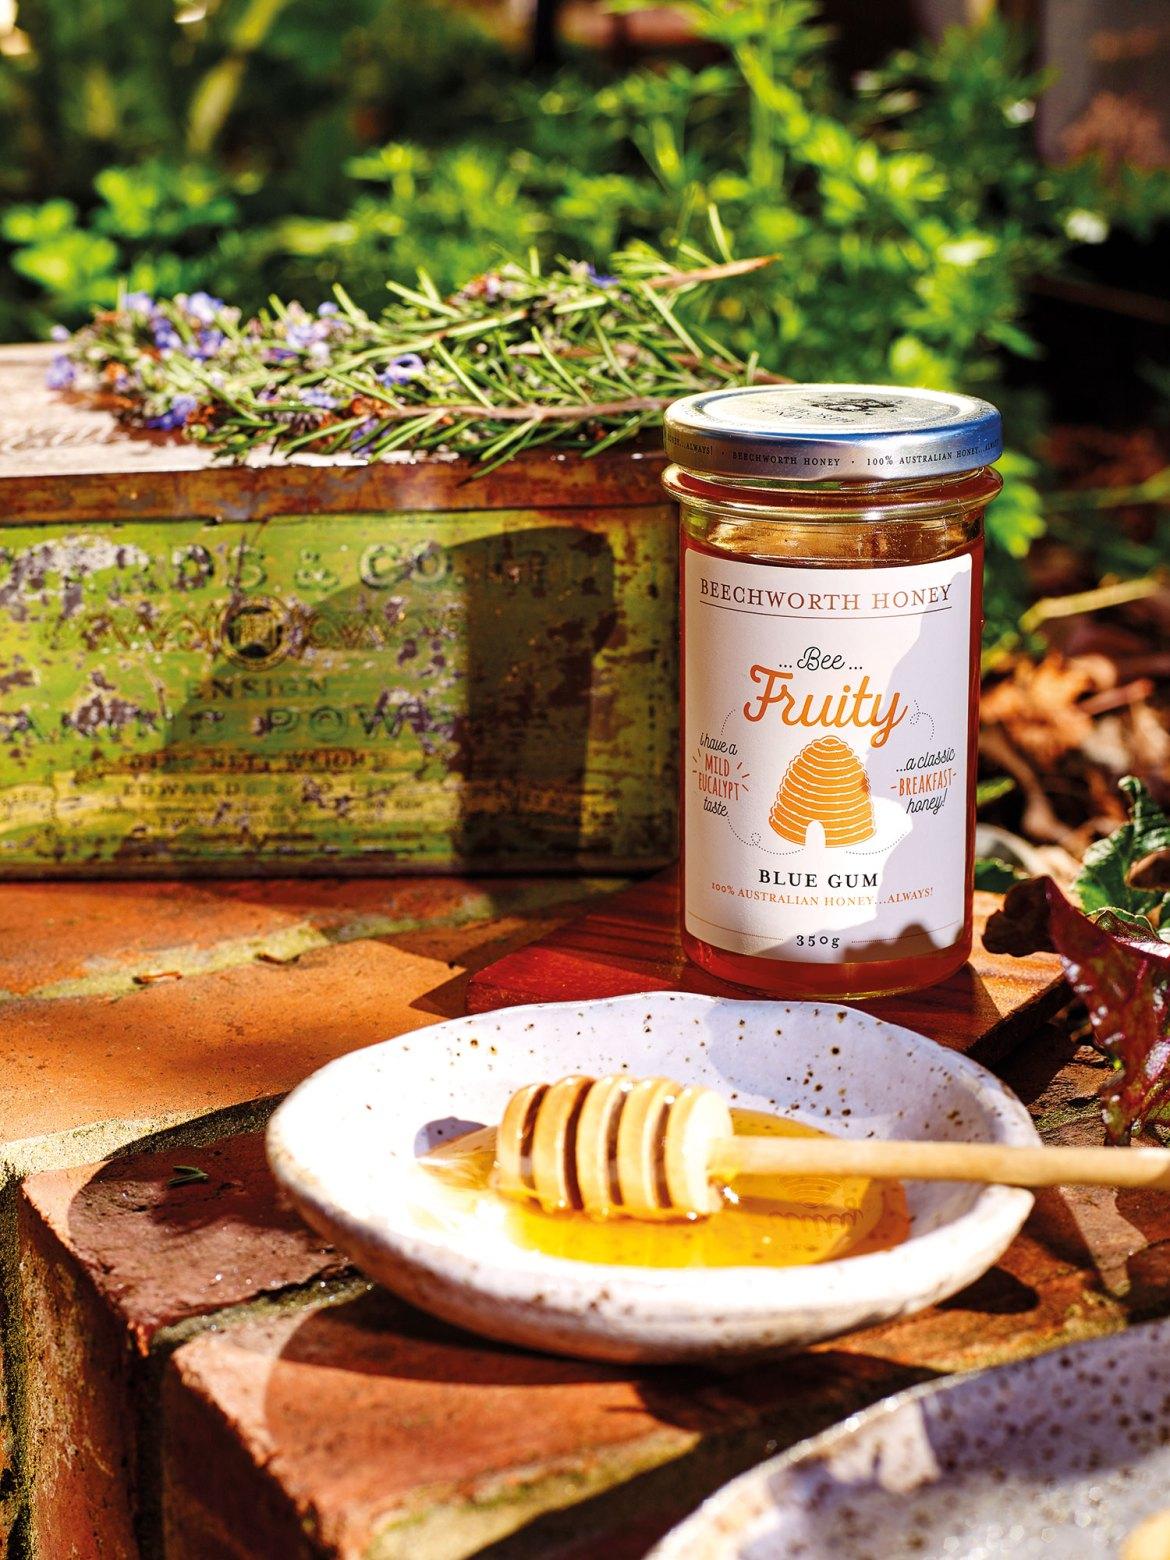 Beechworth Honey's Bee Fruity Blue Gum Honey